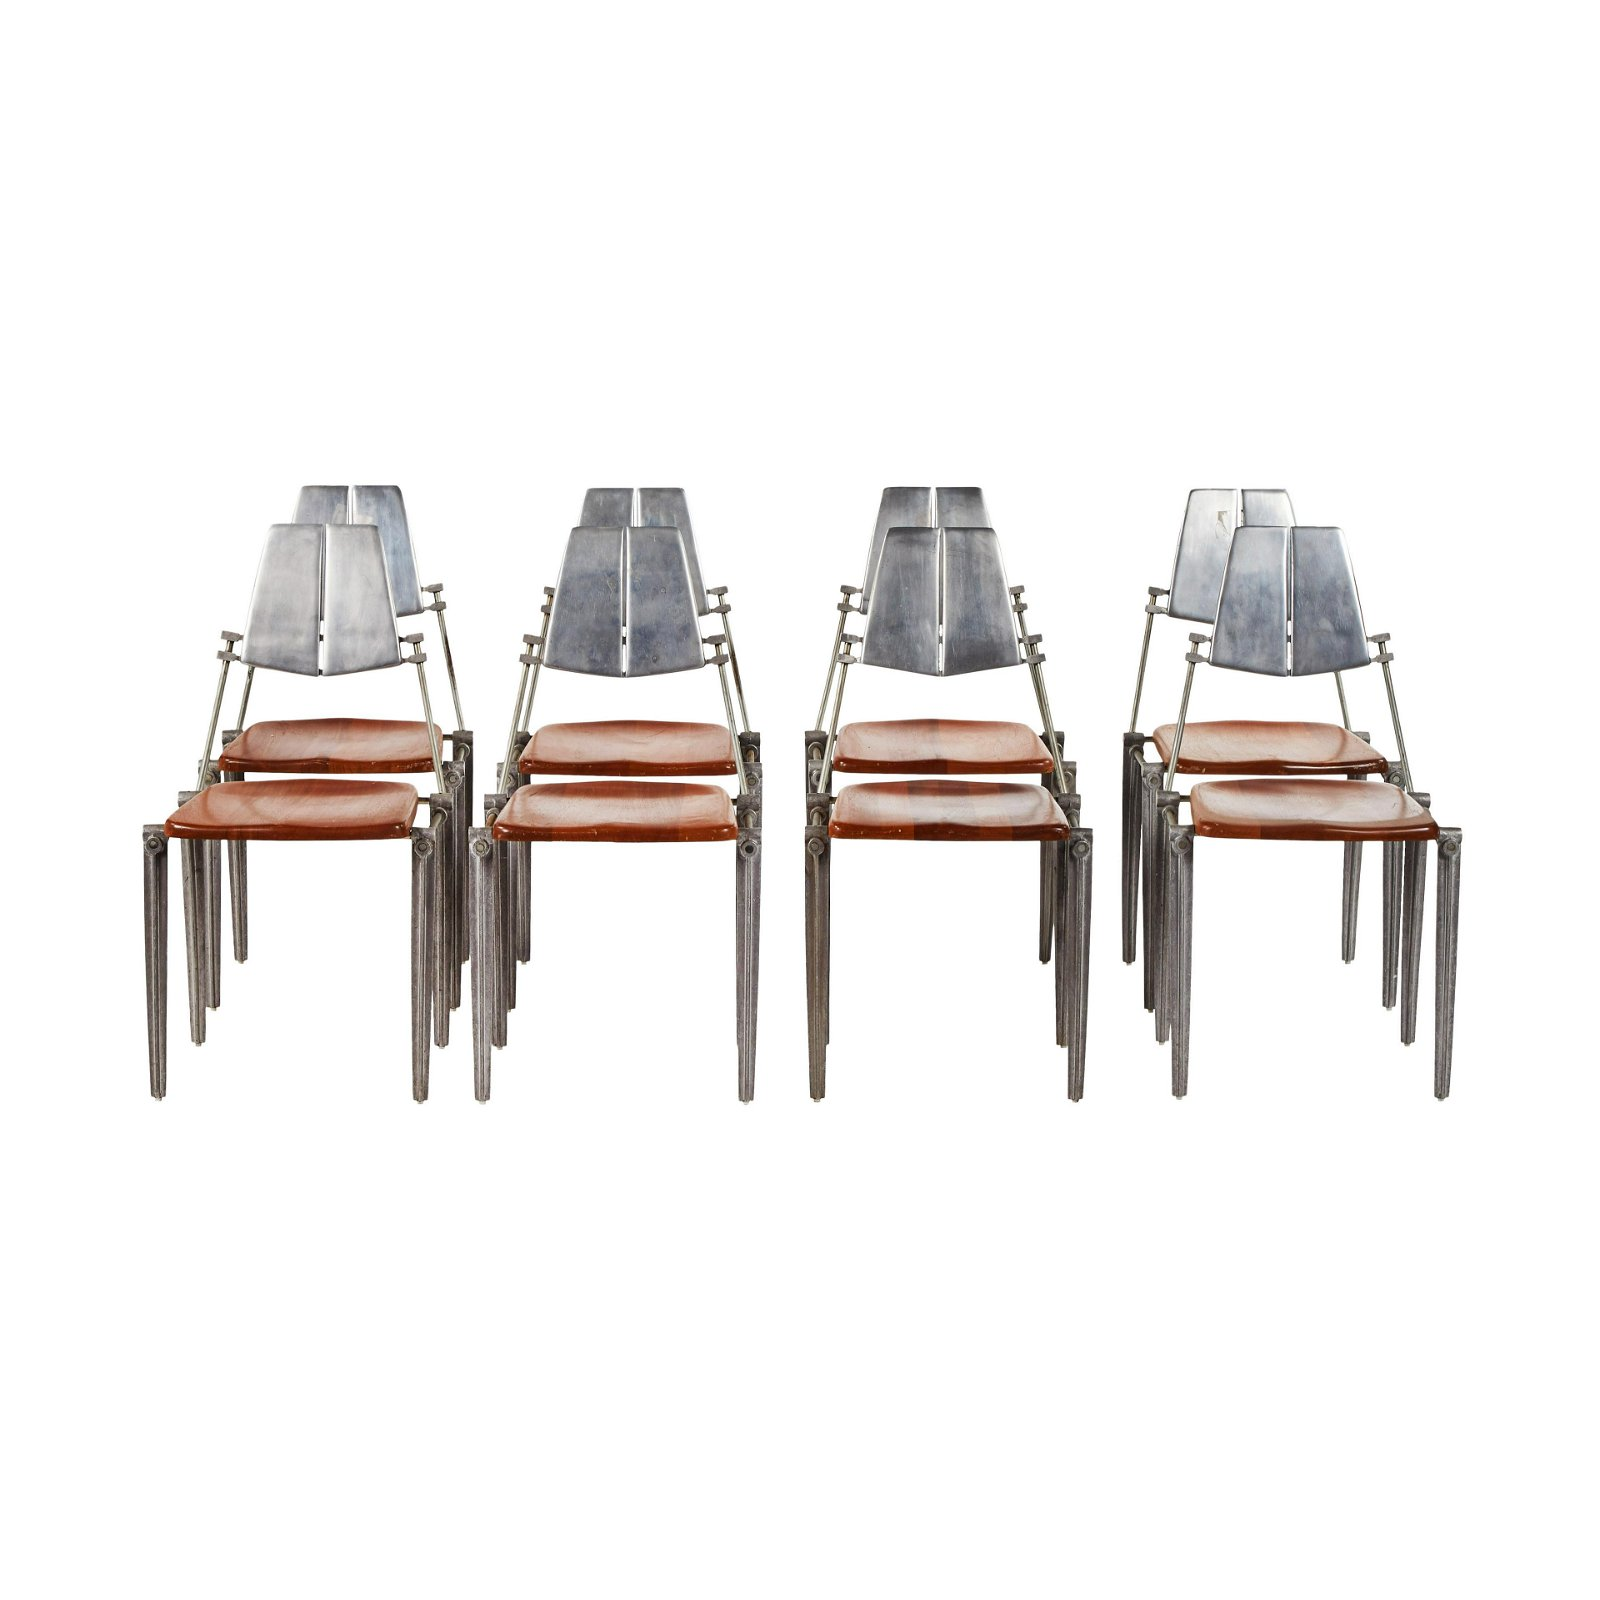 Robert Josten Dining Chairs (8)